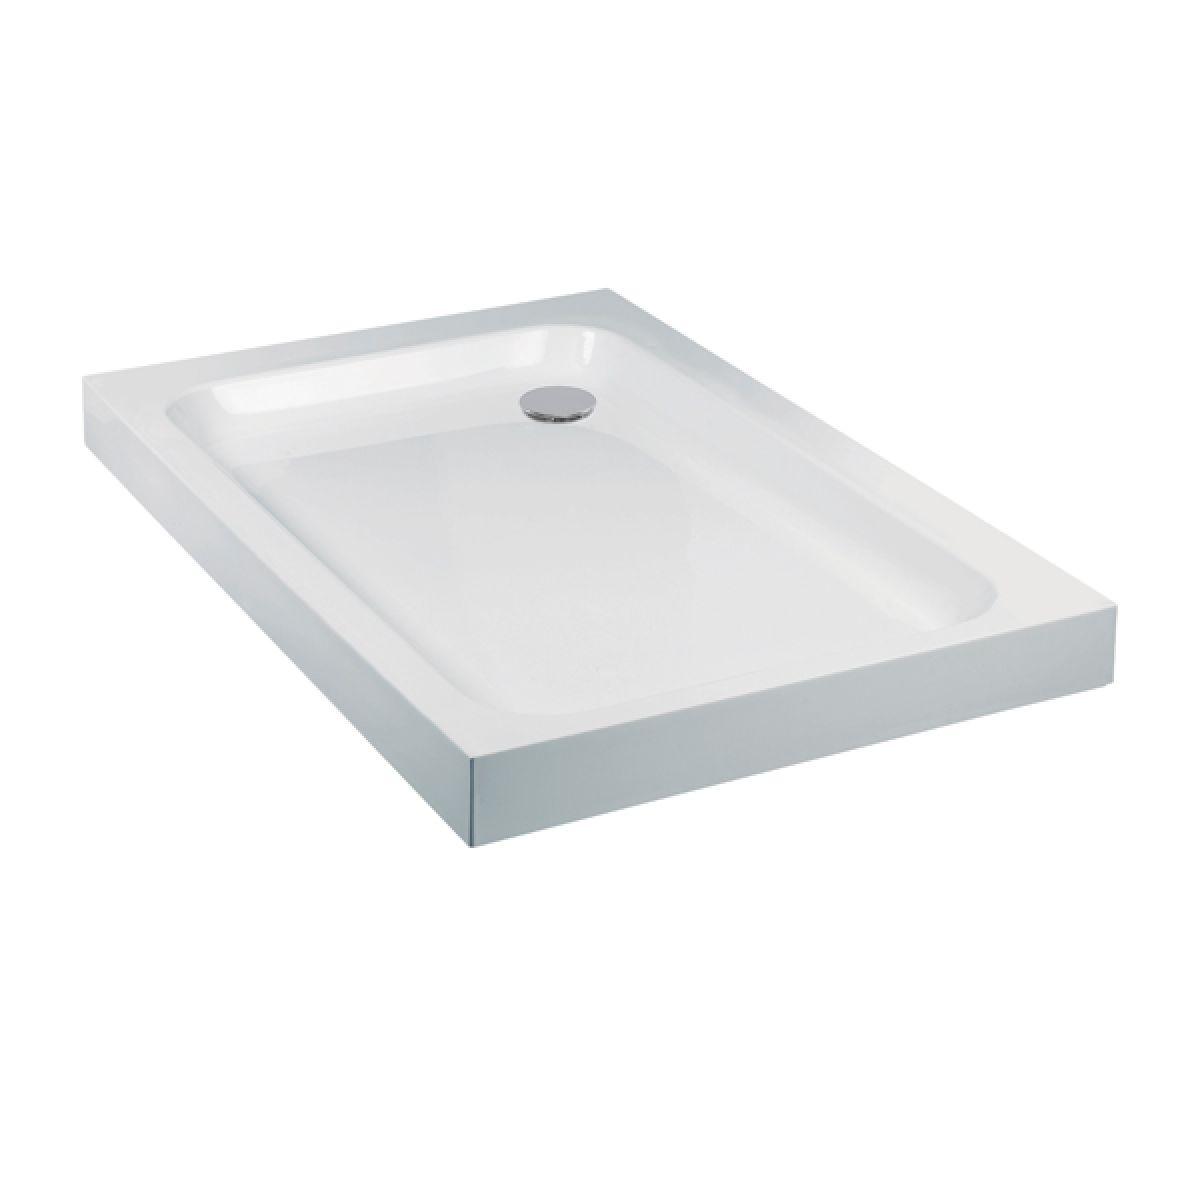 Frontline Standard Rectanglular Shower Tray 1100 x 700mm